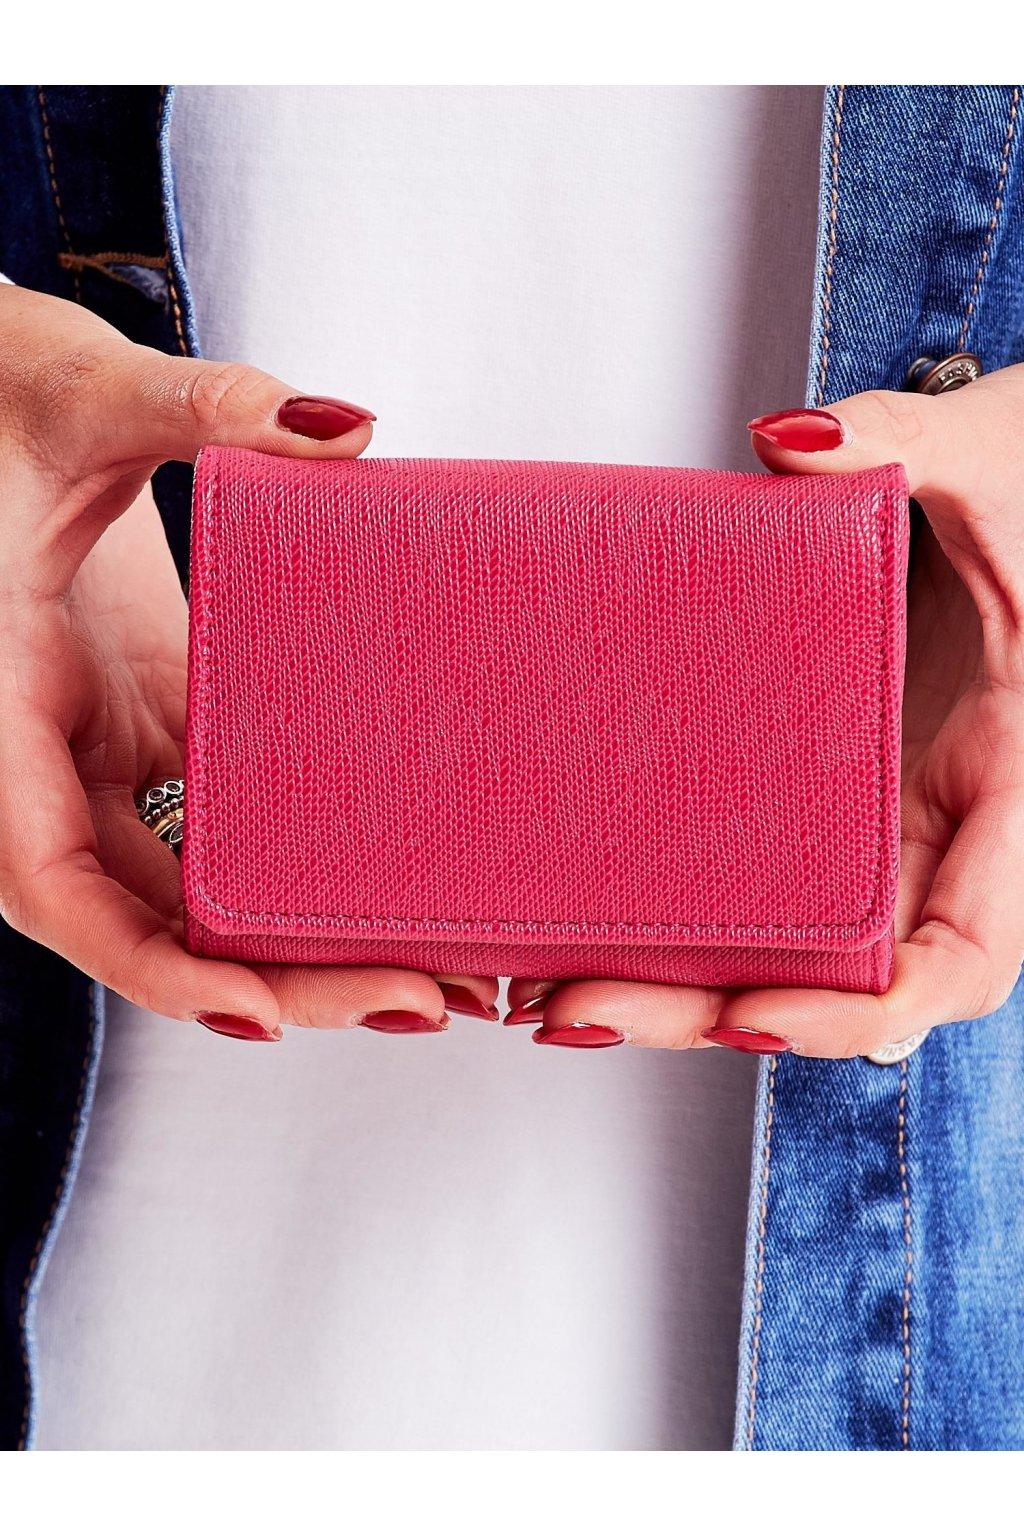 Peňaženka kód G114-1620